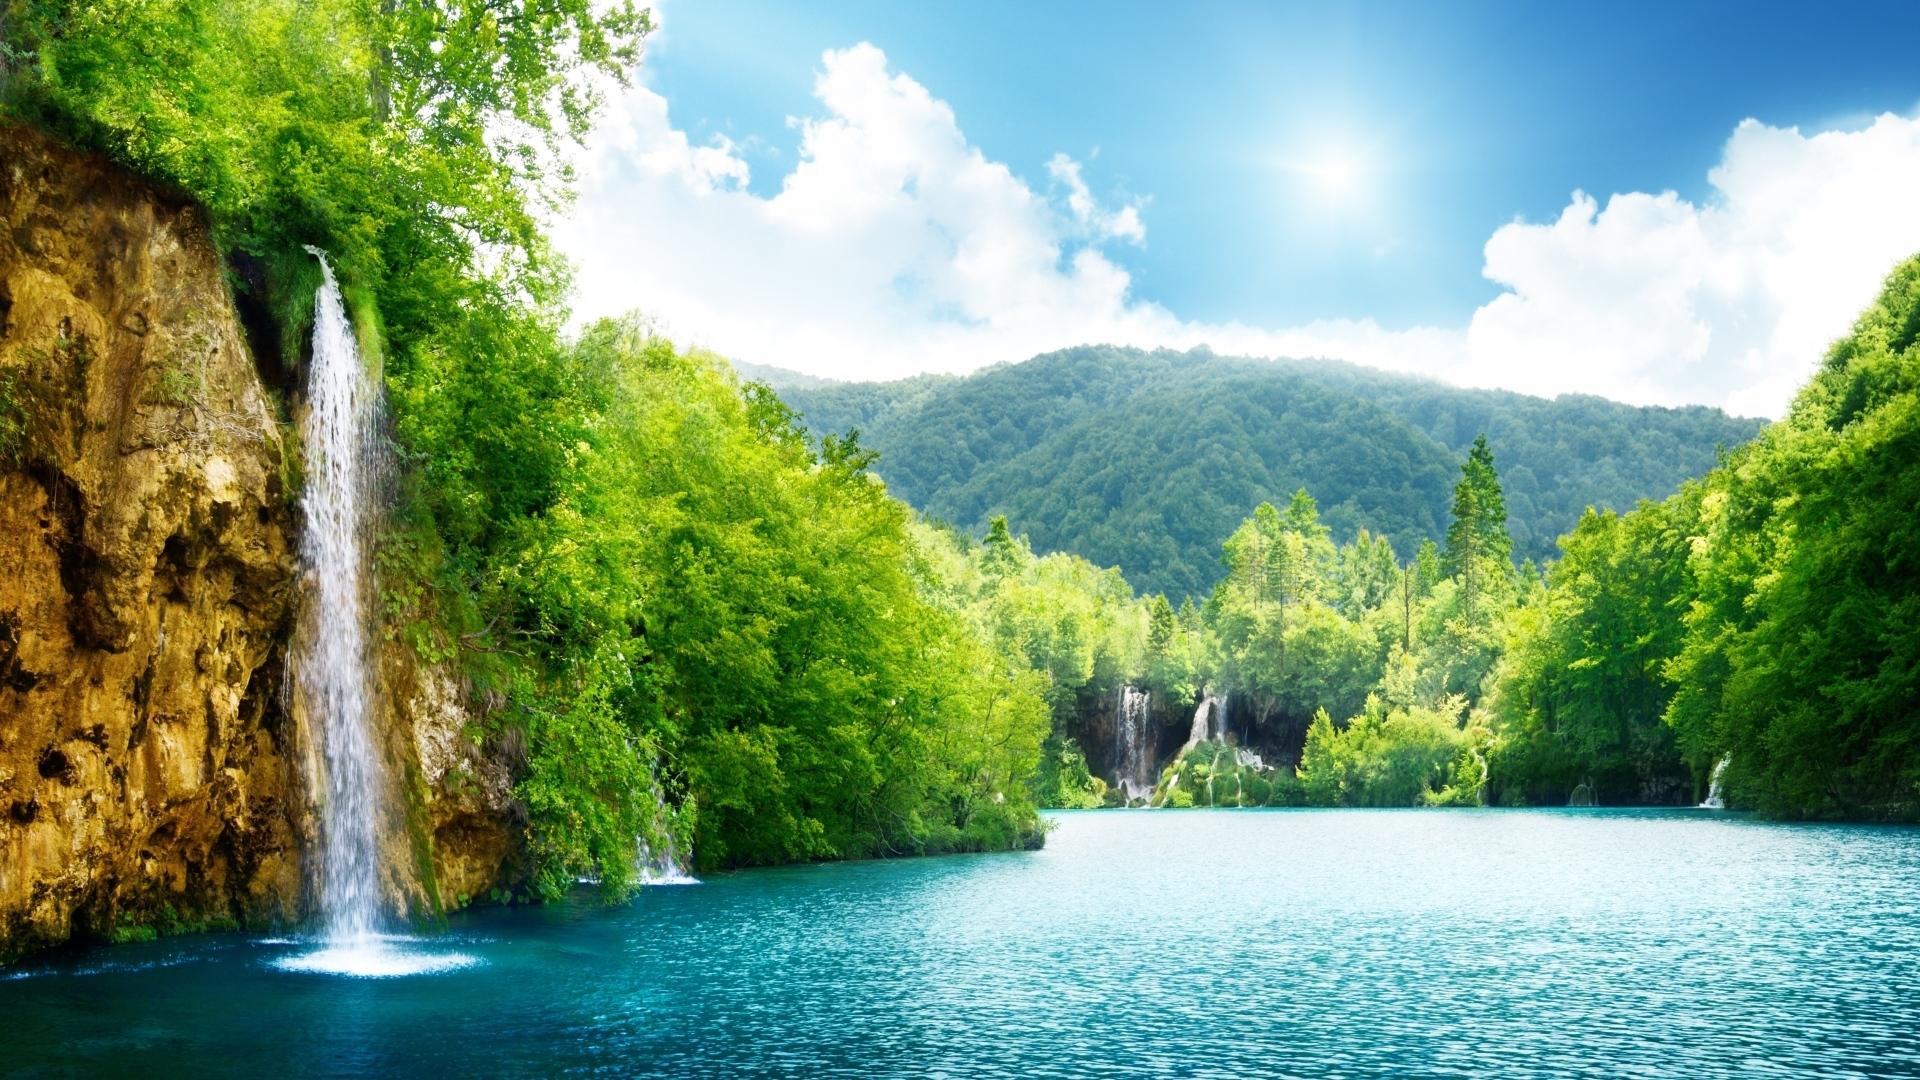 widescreen full hd p nature desktop backgrounds s on wallpaper 1080p